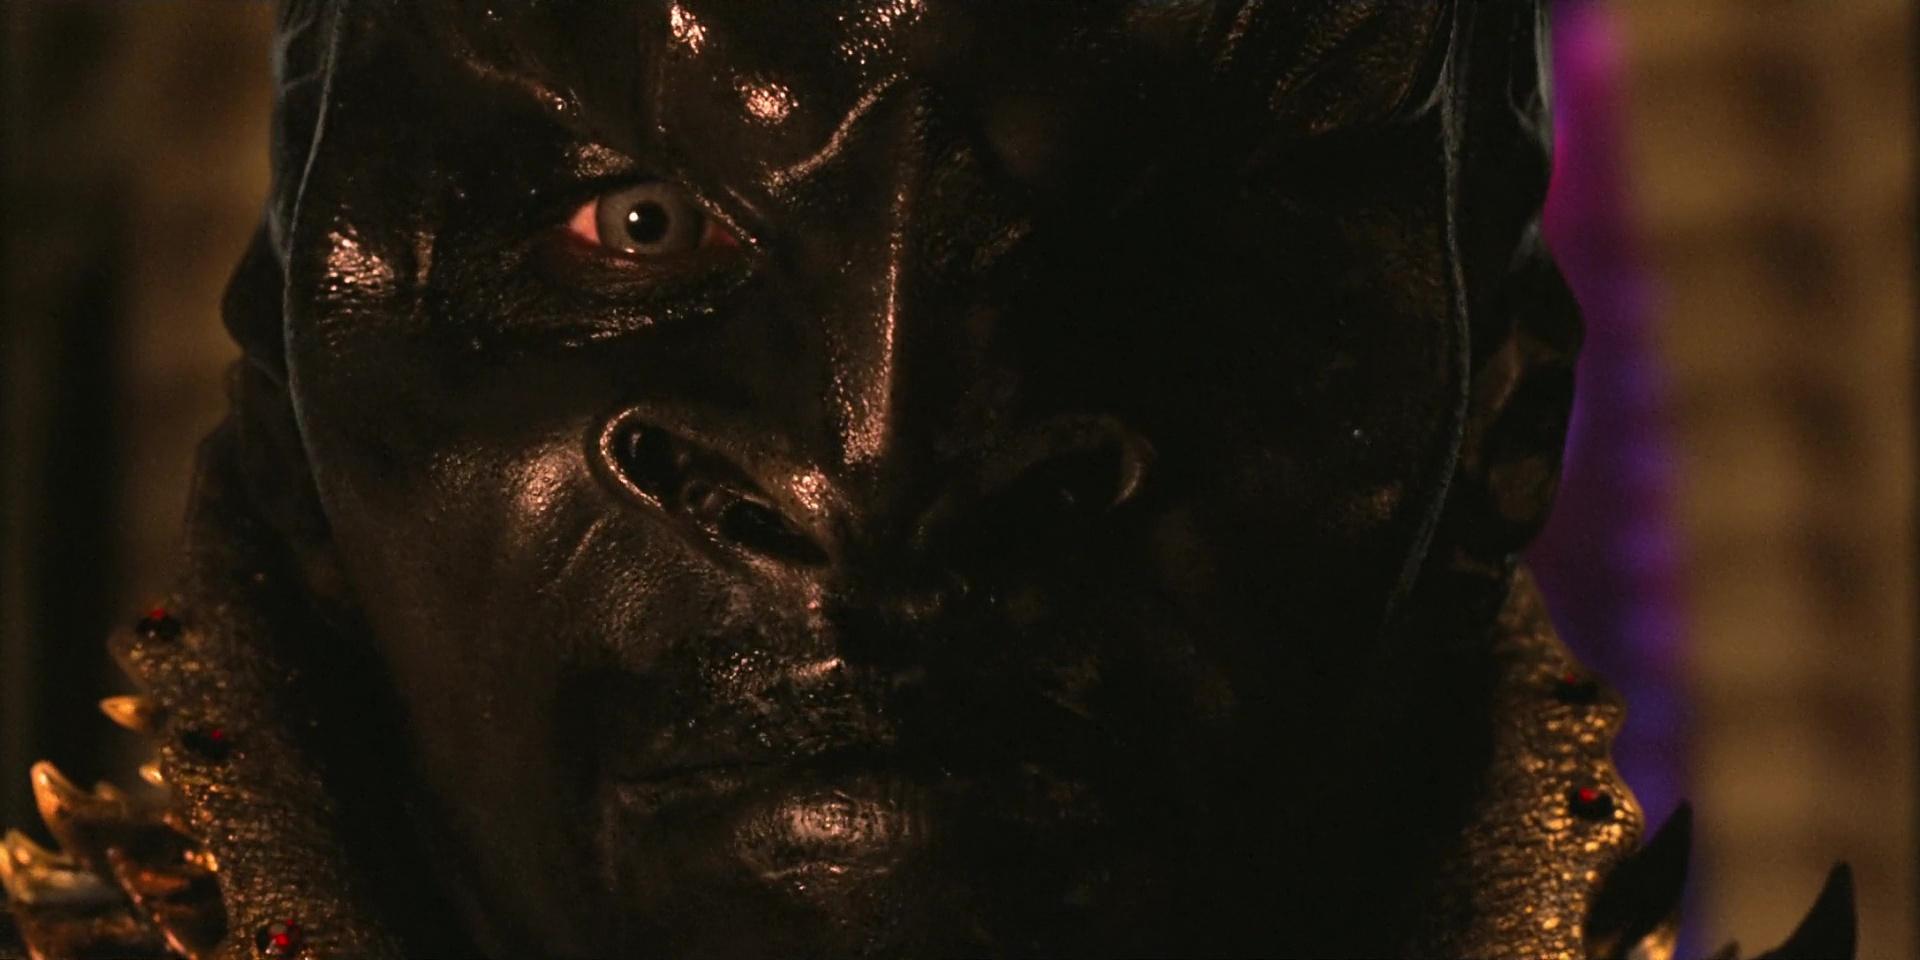 klingon_star_trek_discovery.jpg